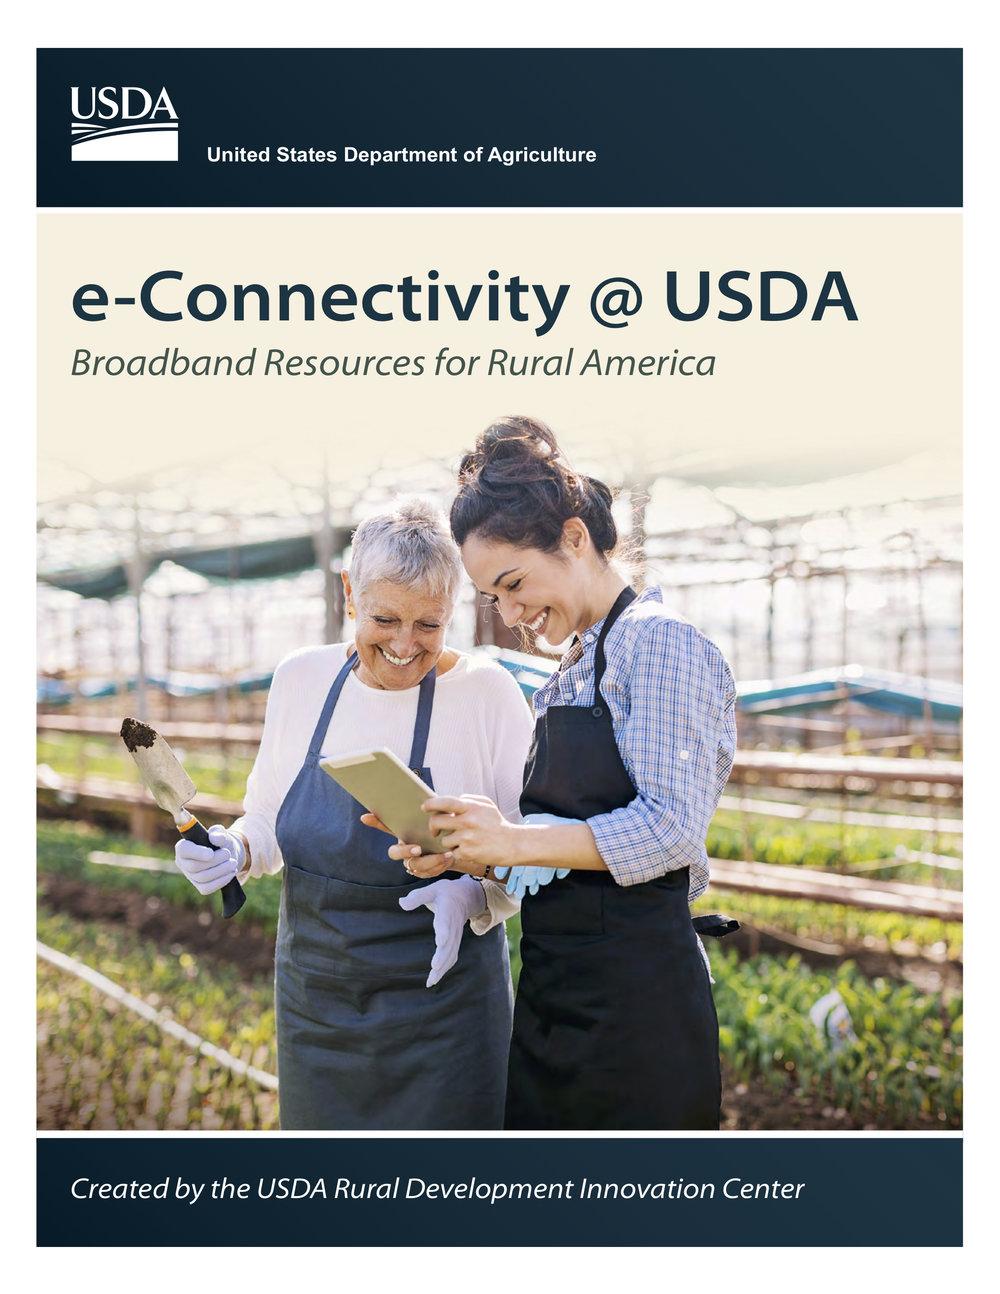 USDA Reconnect Community Tool Kita.jpg